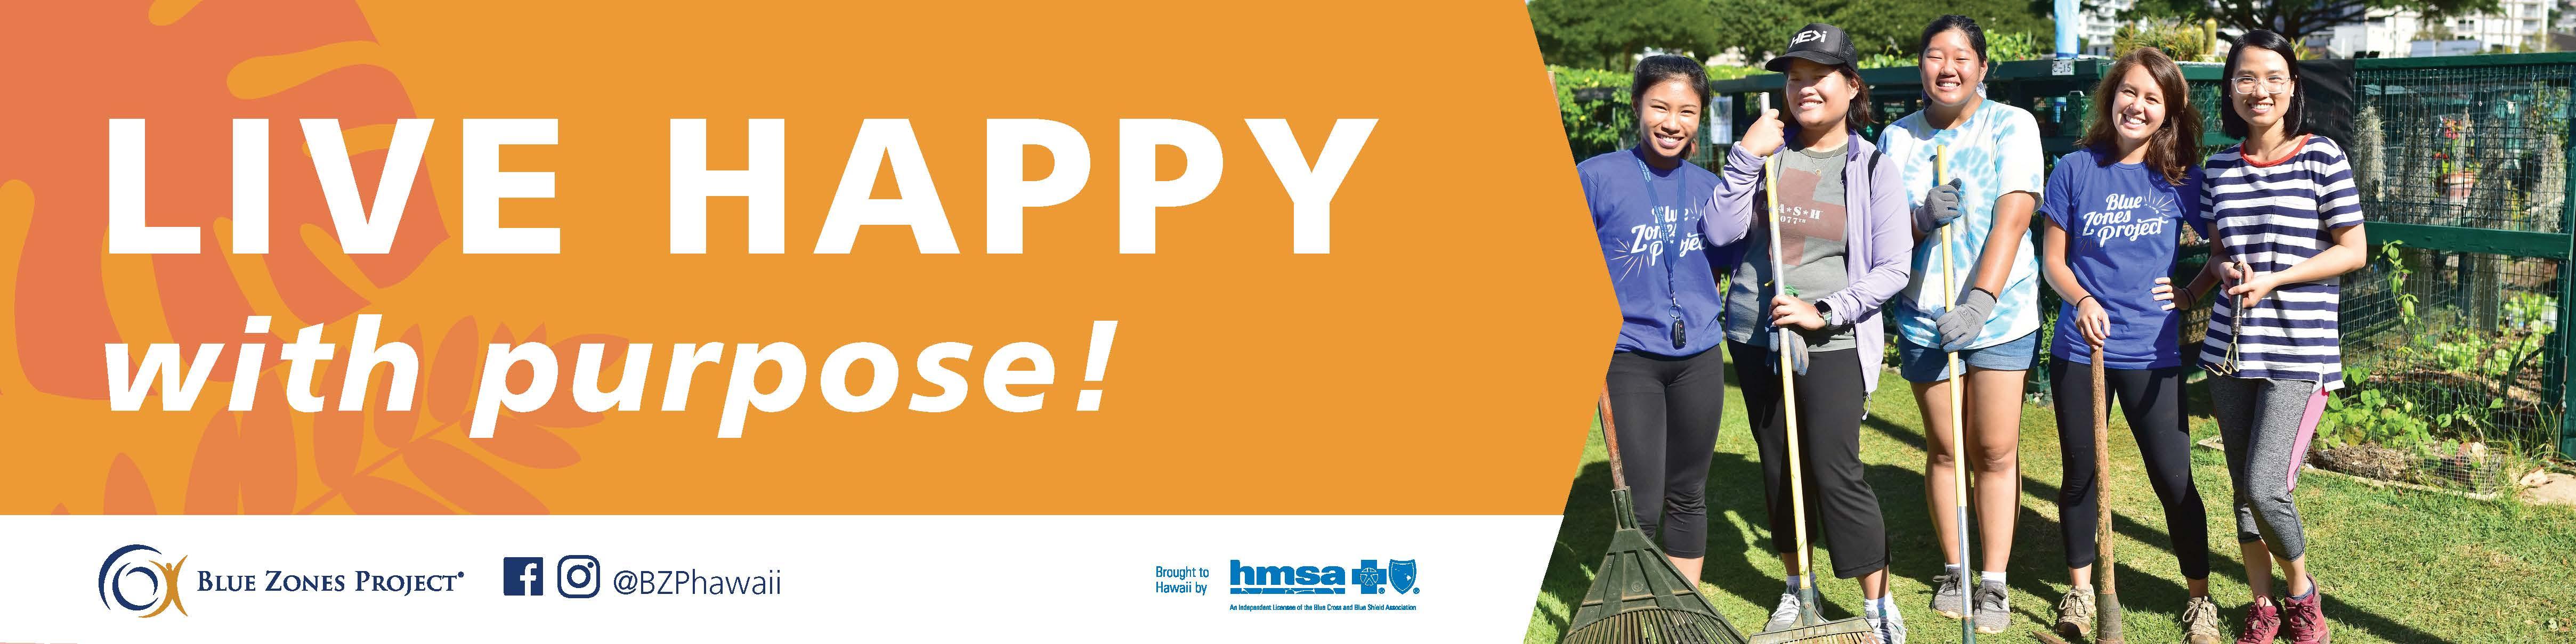 Live Happy, With Purpose!